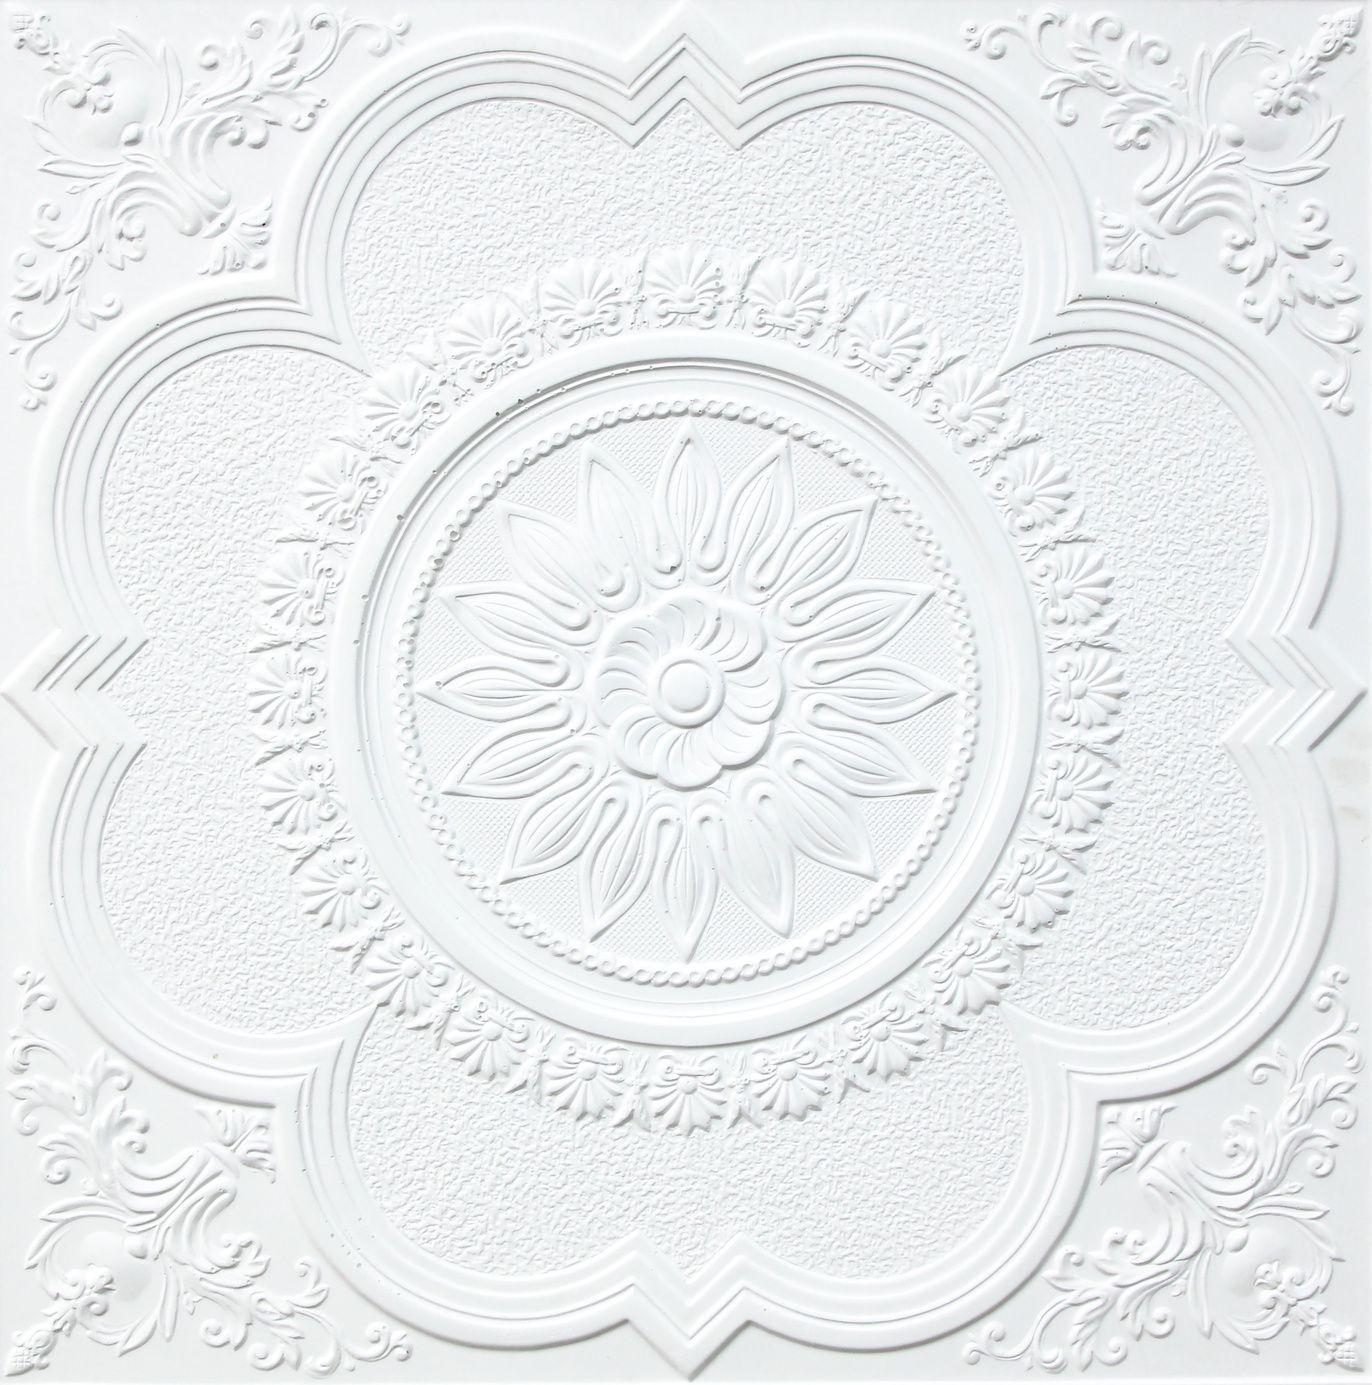 Modern asma tavan modelleri ehil ustalar - Asma Tavan Kap Kemer Modelleri Kartonpiyer Stropiyer Al Rk Na Mensup